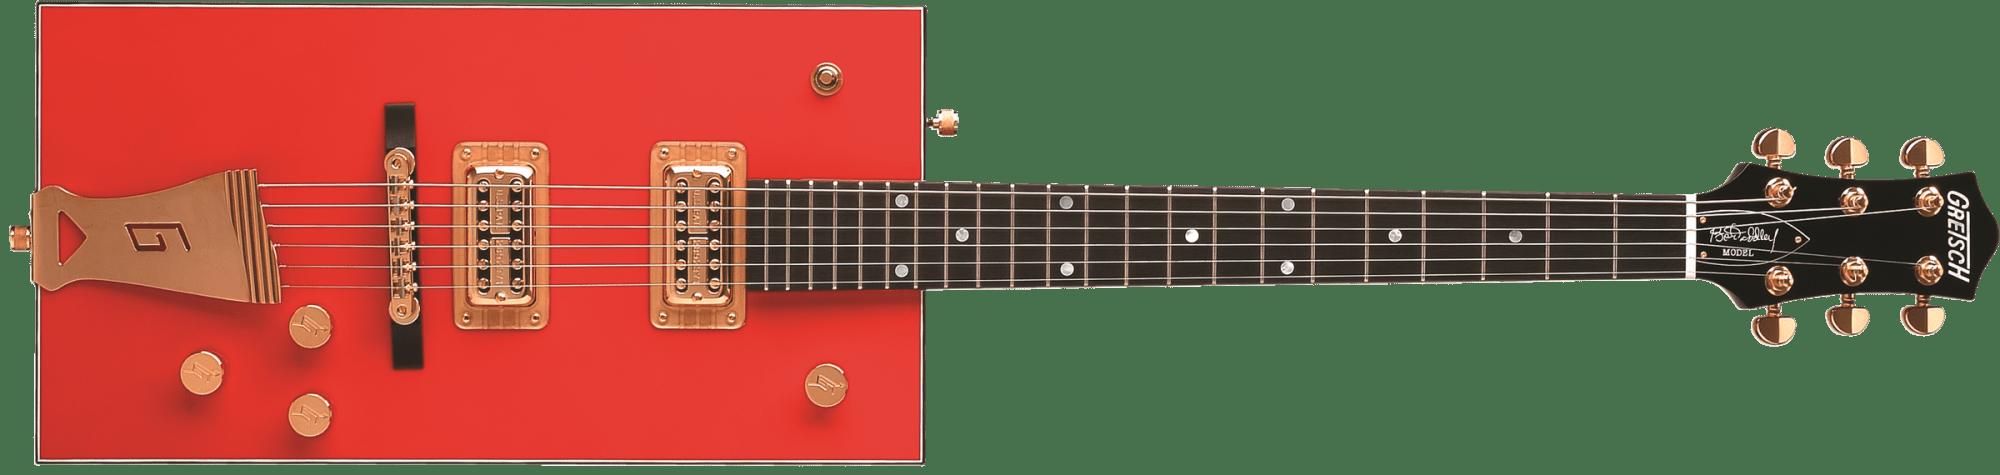 hight resolution of g6138 bo diddley g cutout tailpiece ebony fingerboard firebird red